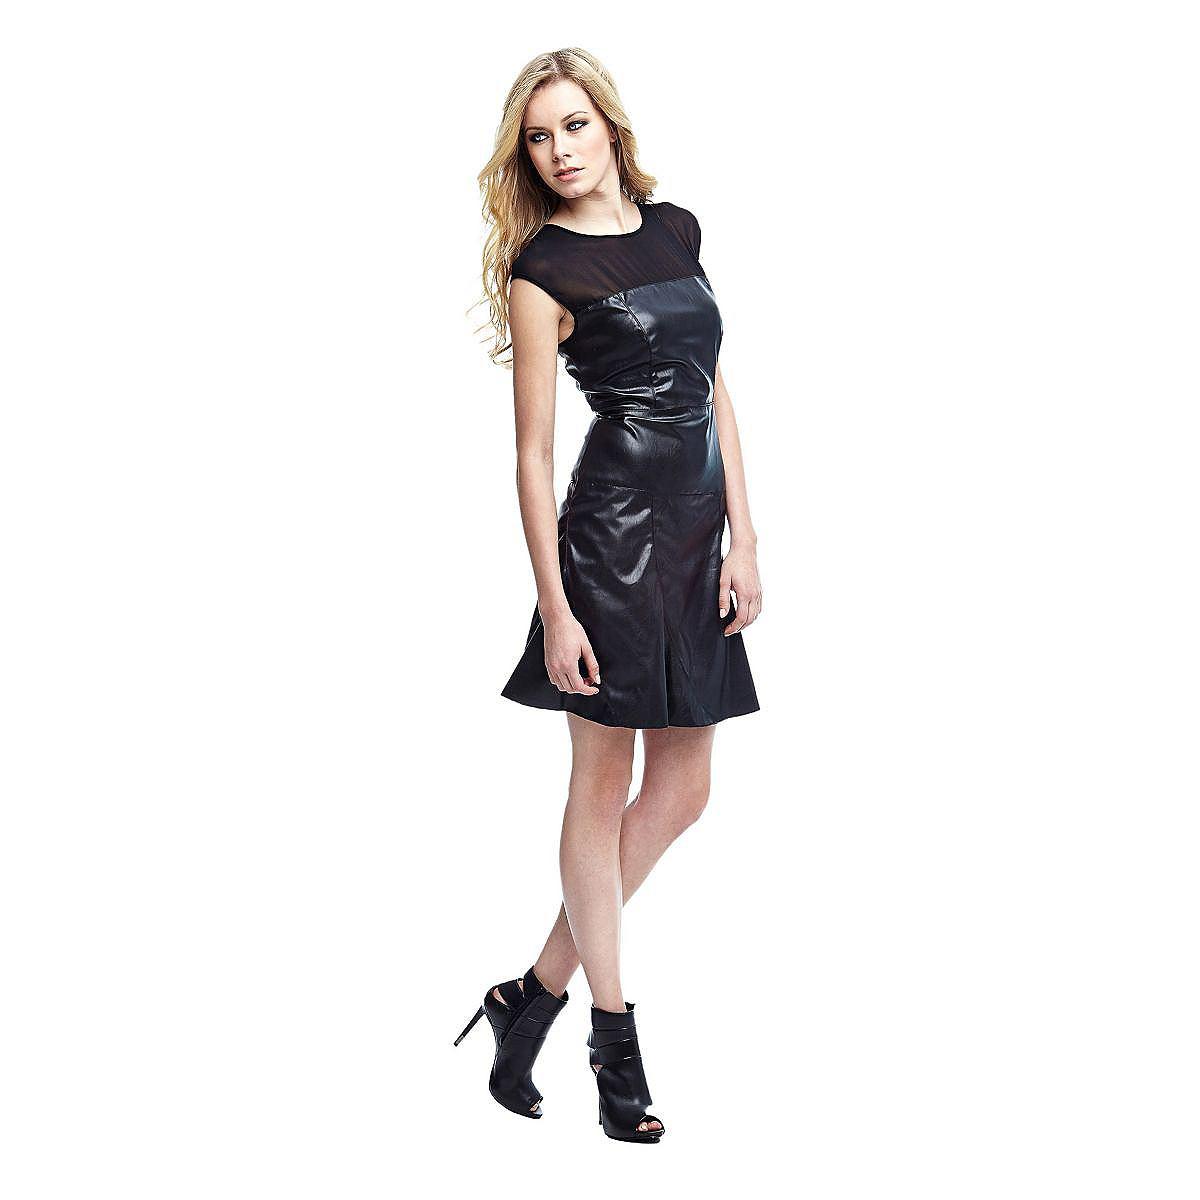 Guess jurk in gecoate look zwart